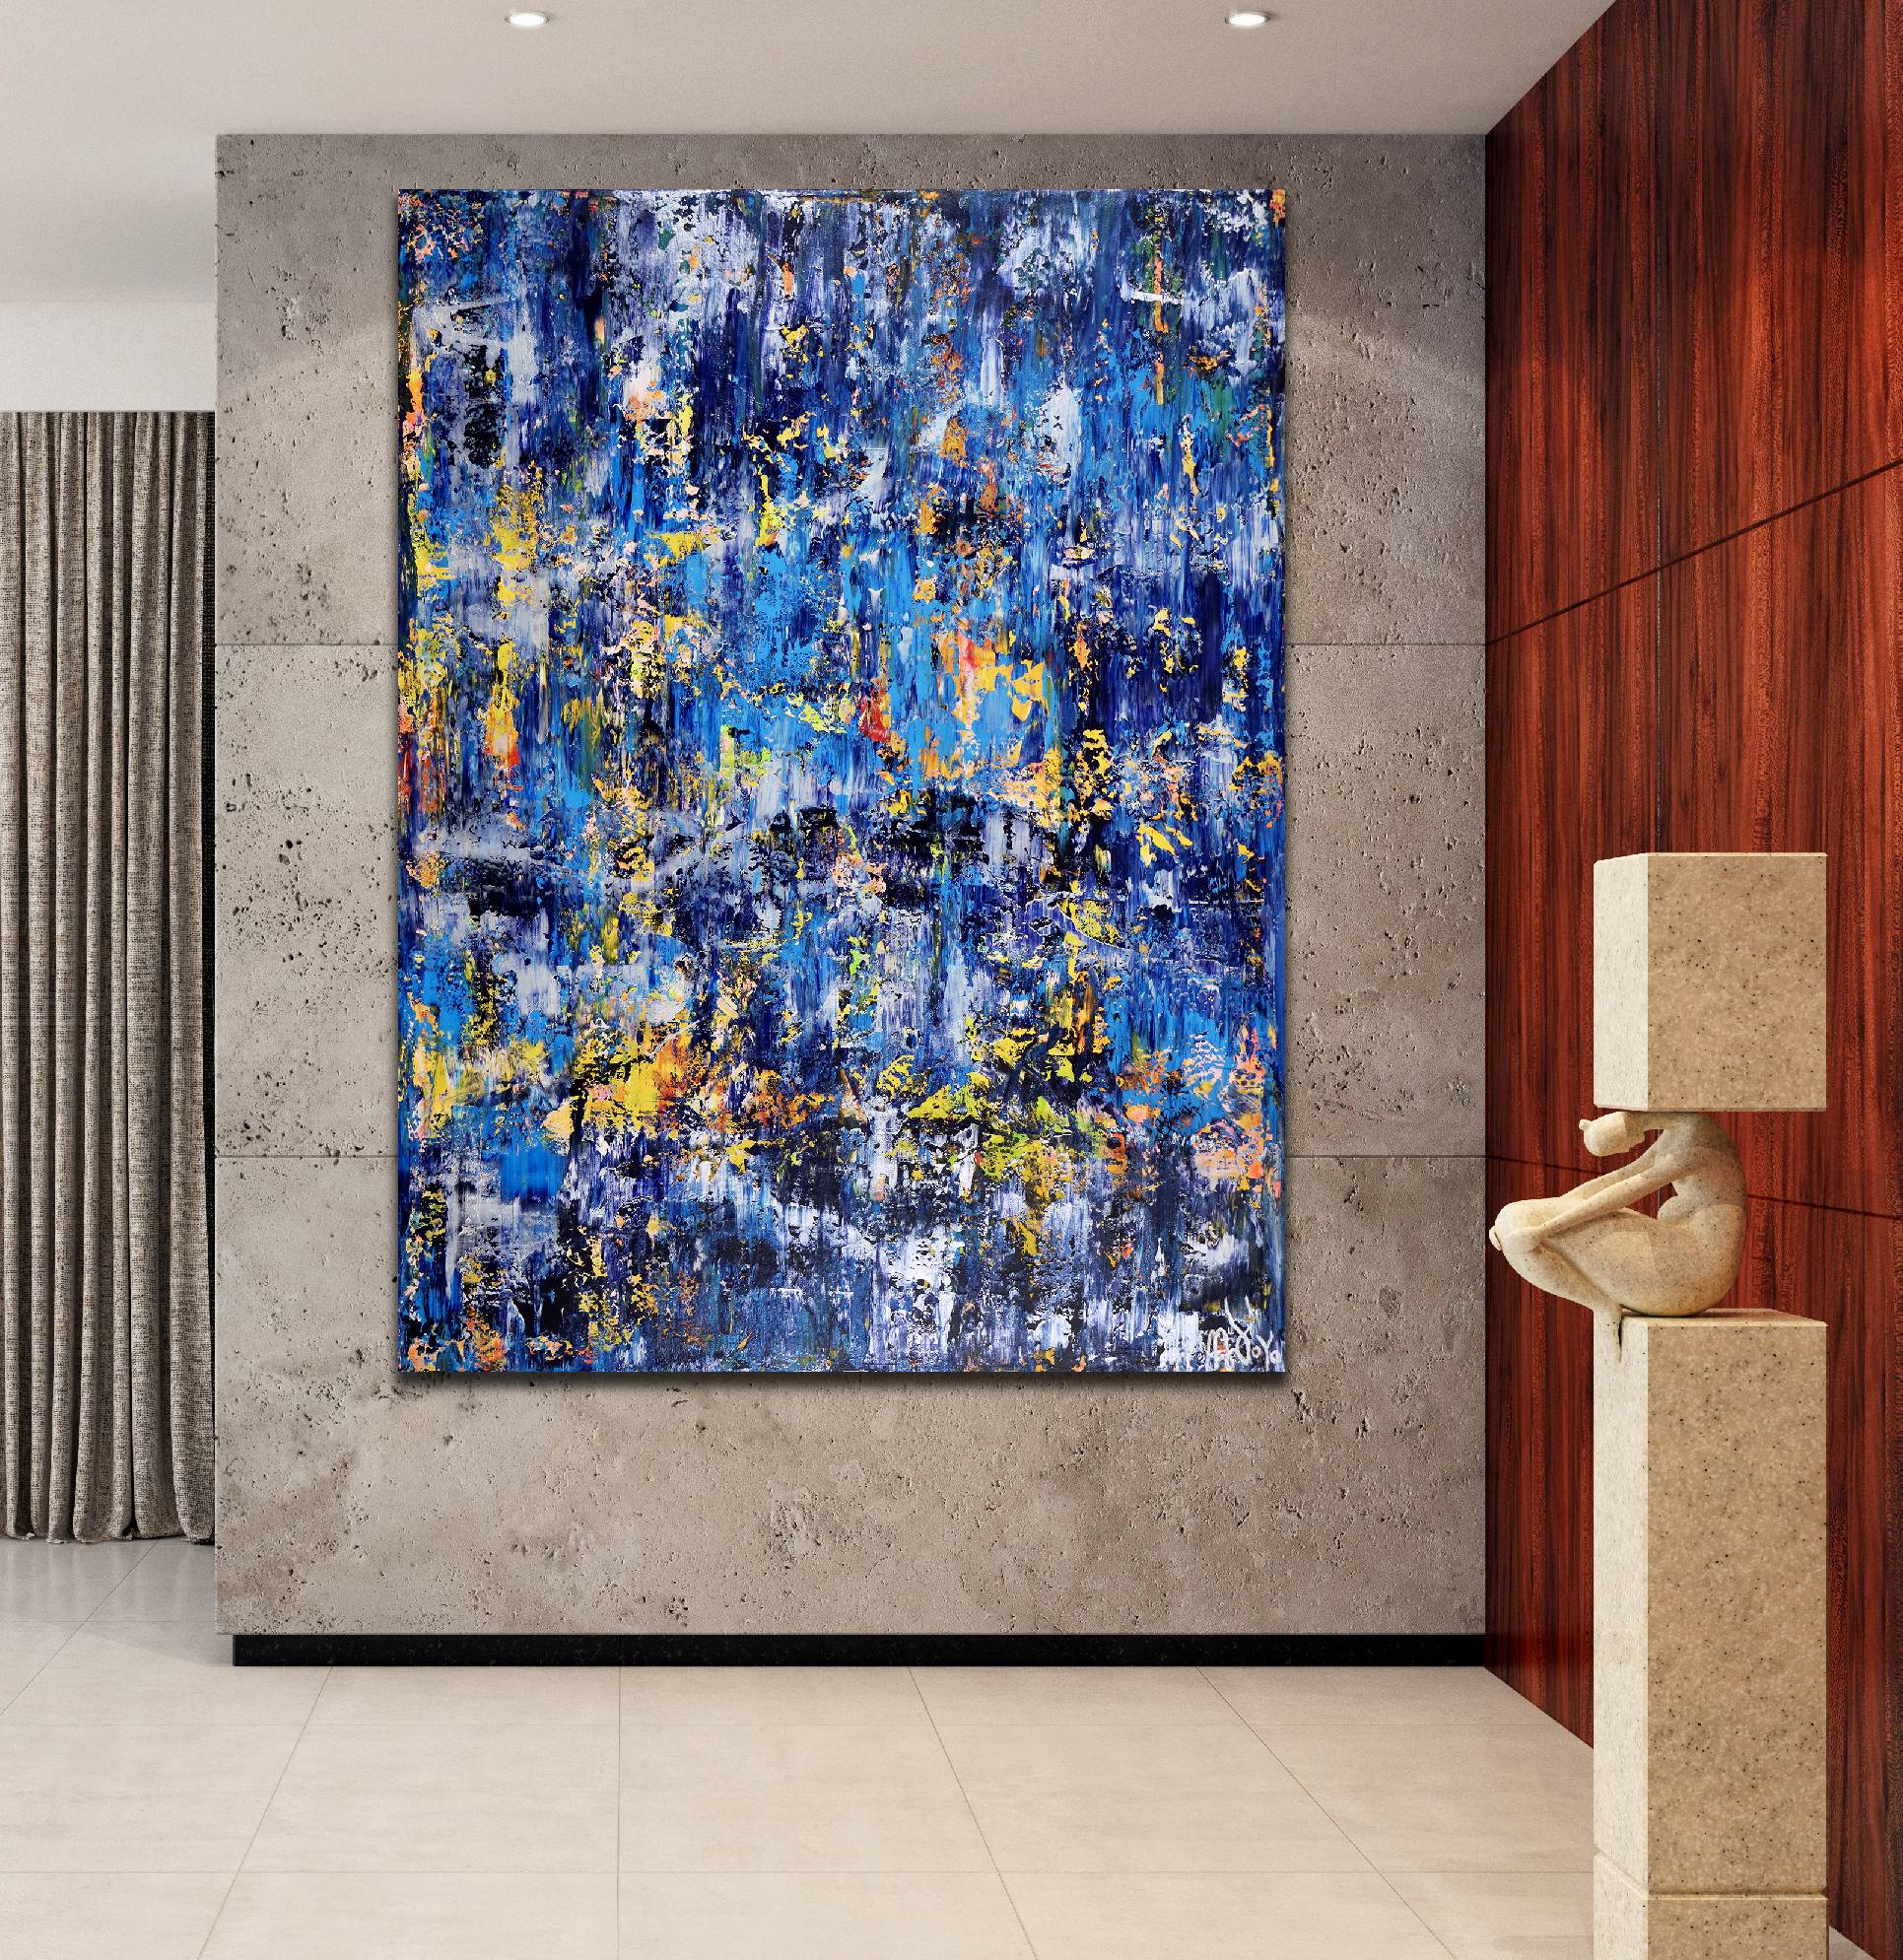 Room View - Rapid Iridescent Cascades (2020) by Nestor Toro